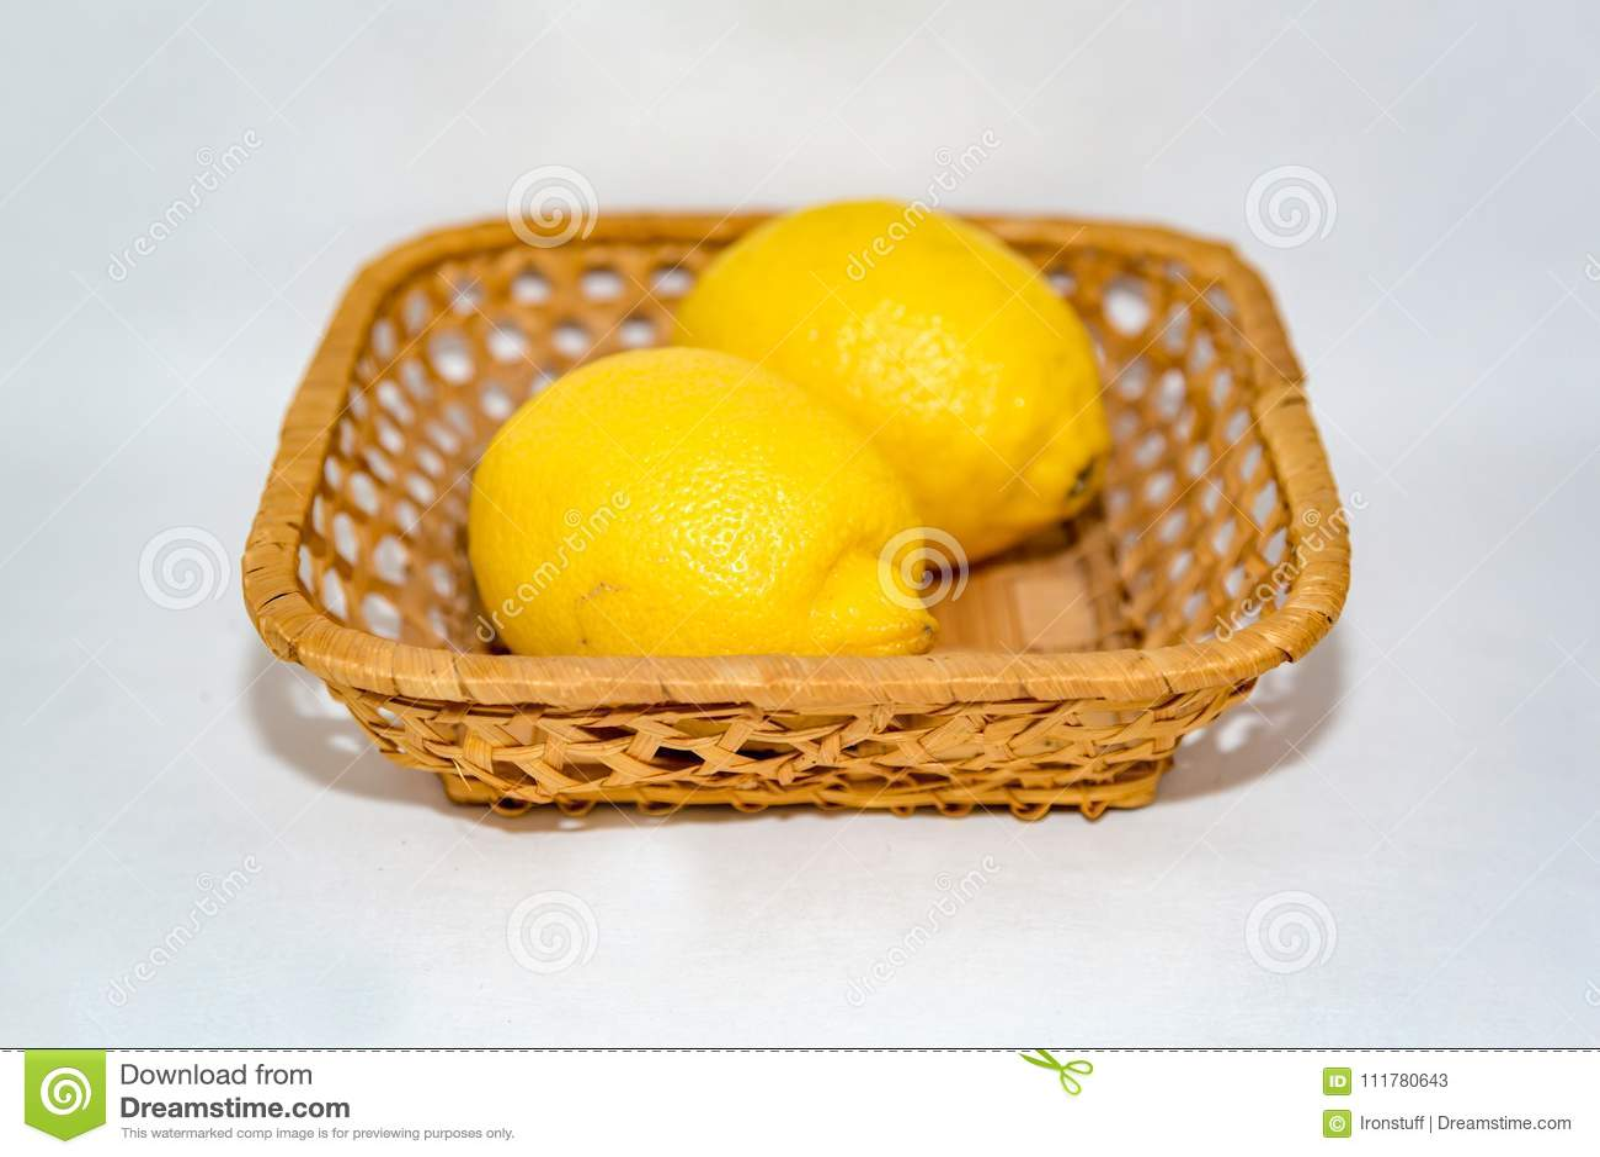 Yellow lemons in a basket